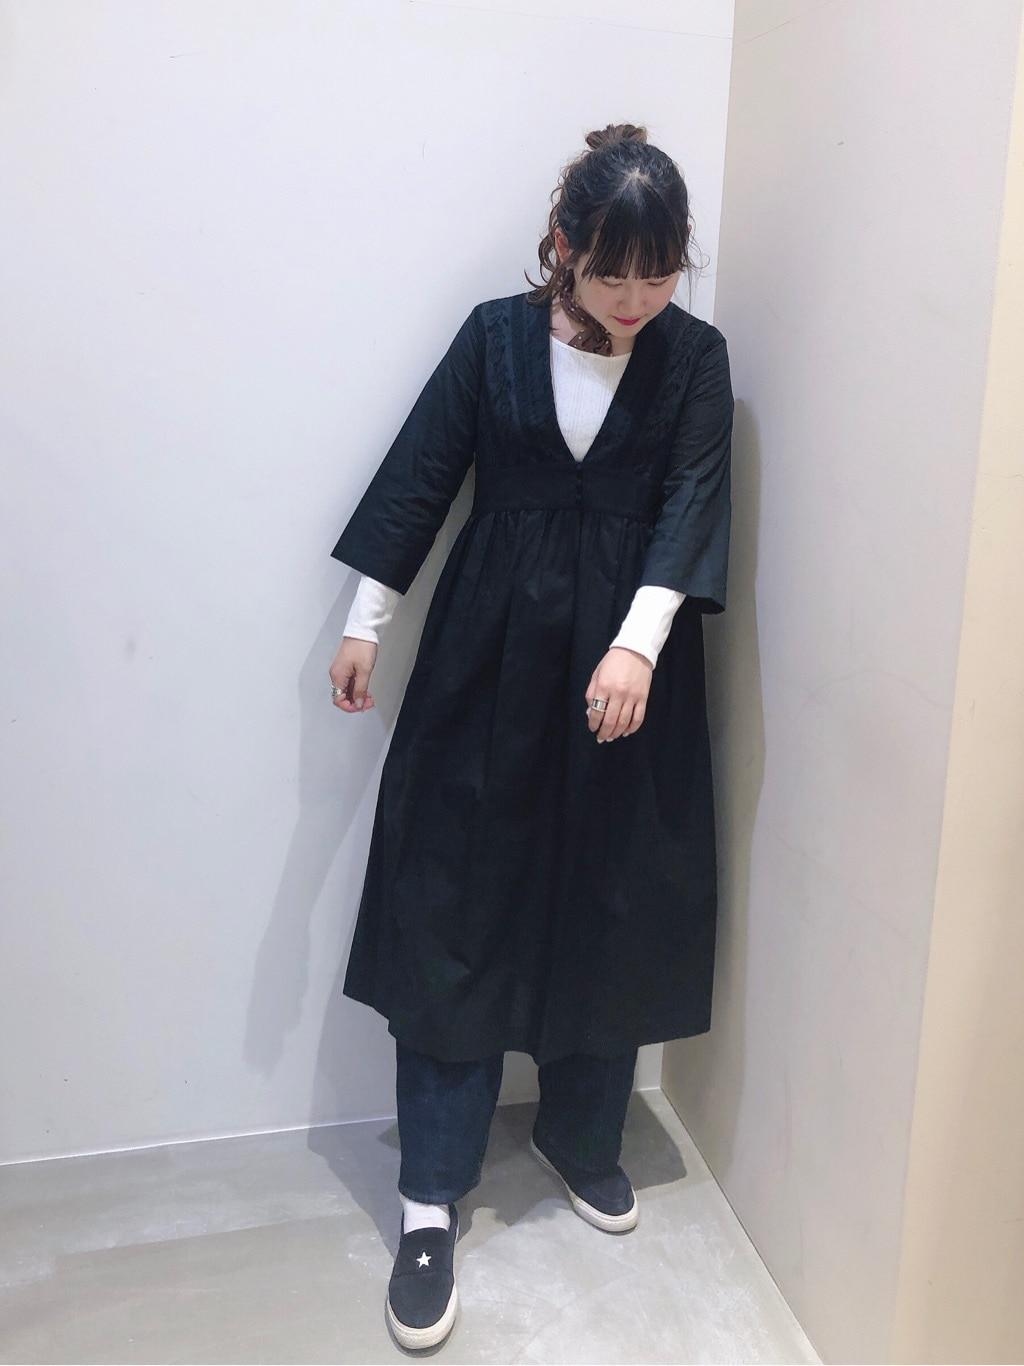 bulle de savon 阪急西宮ガーデンズ 身長:166cm 2020.03.16